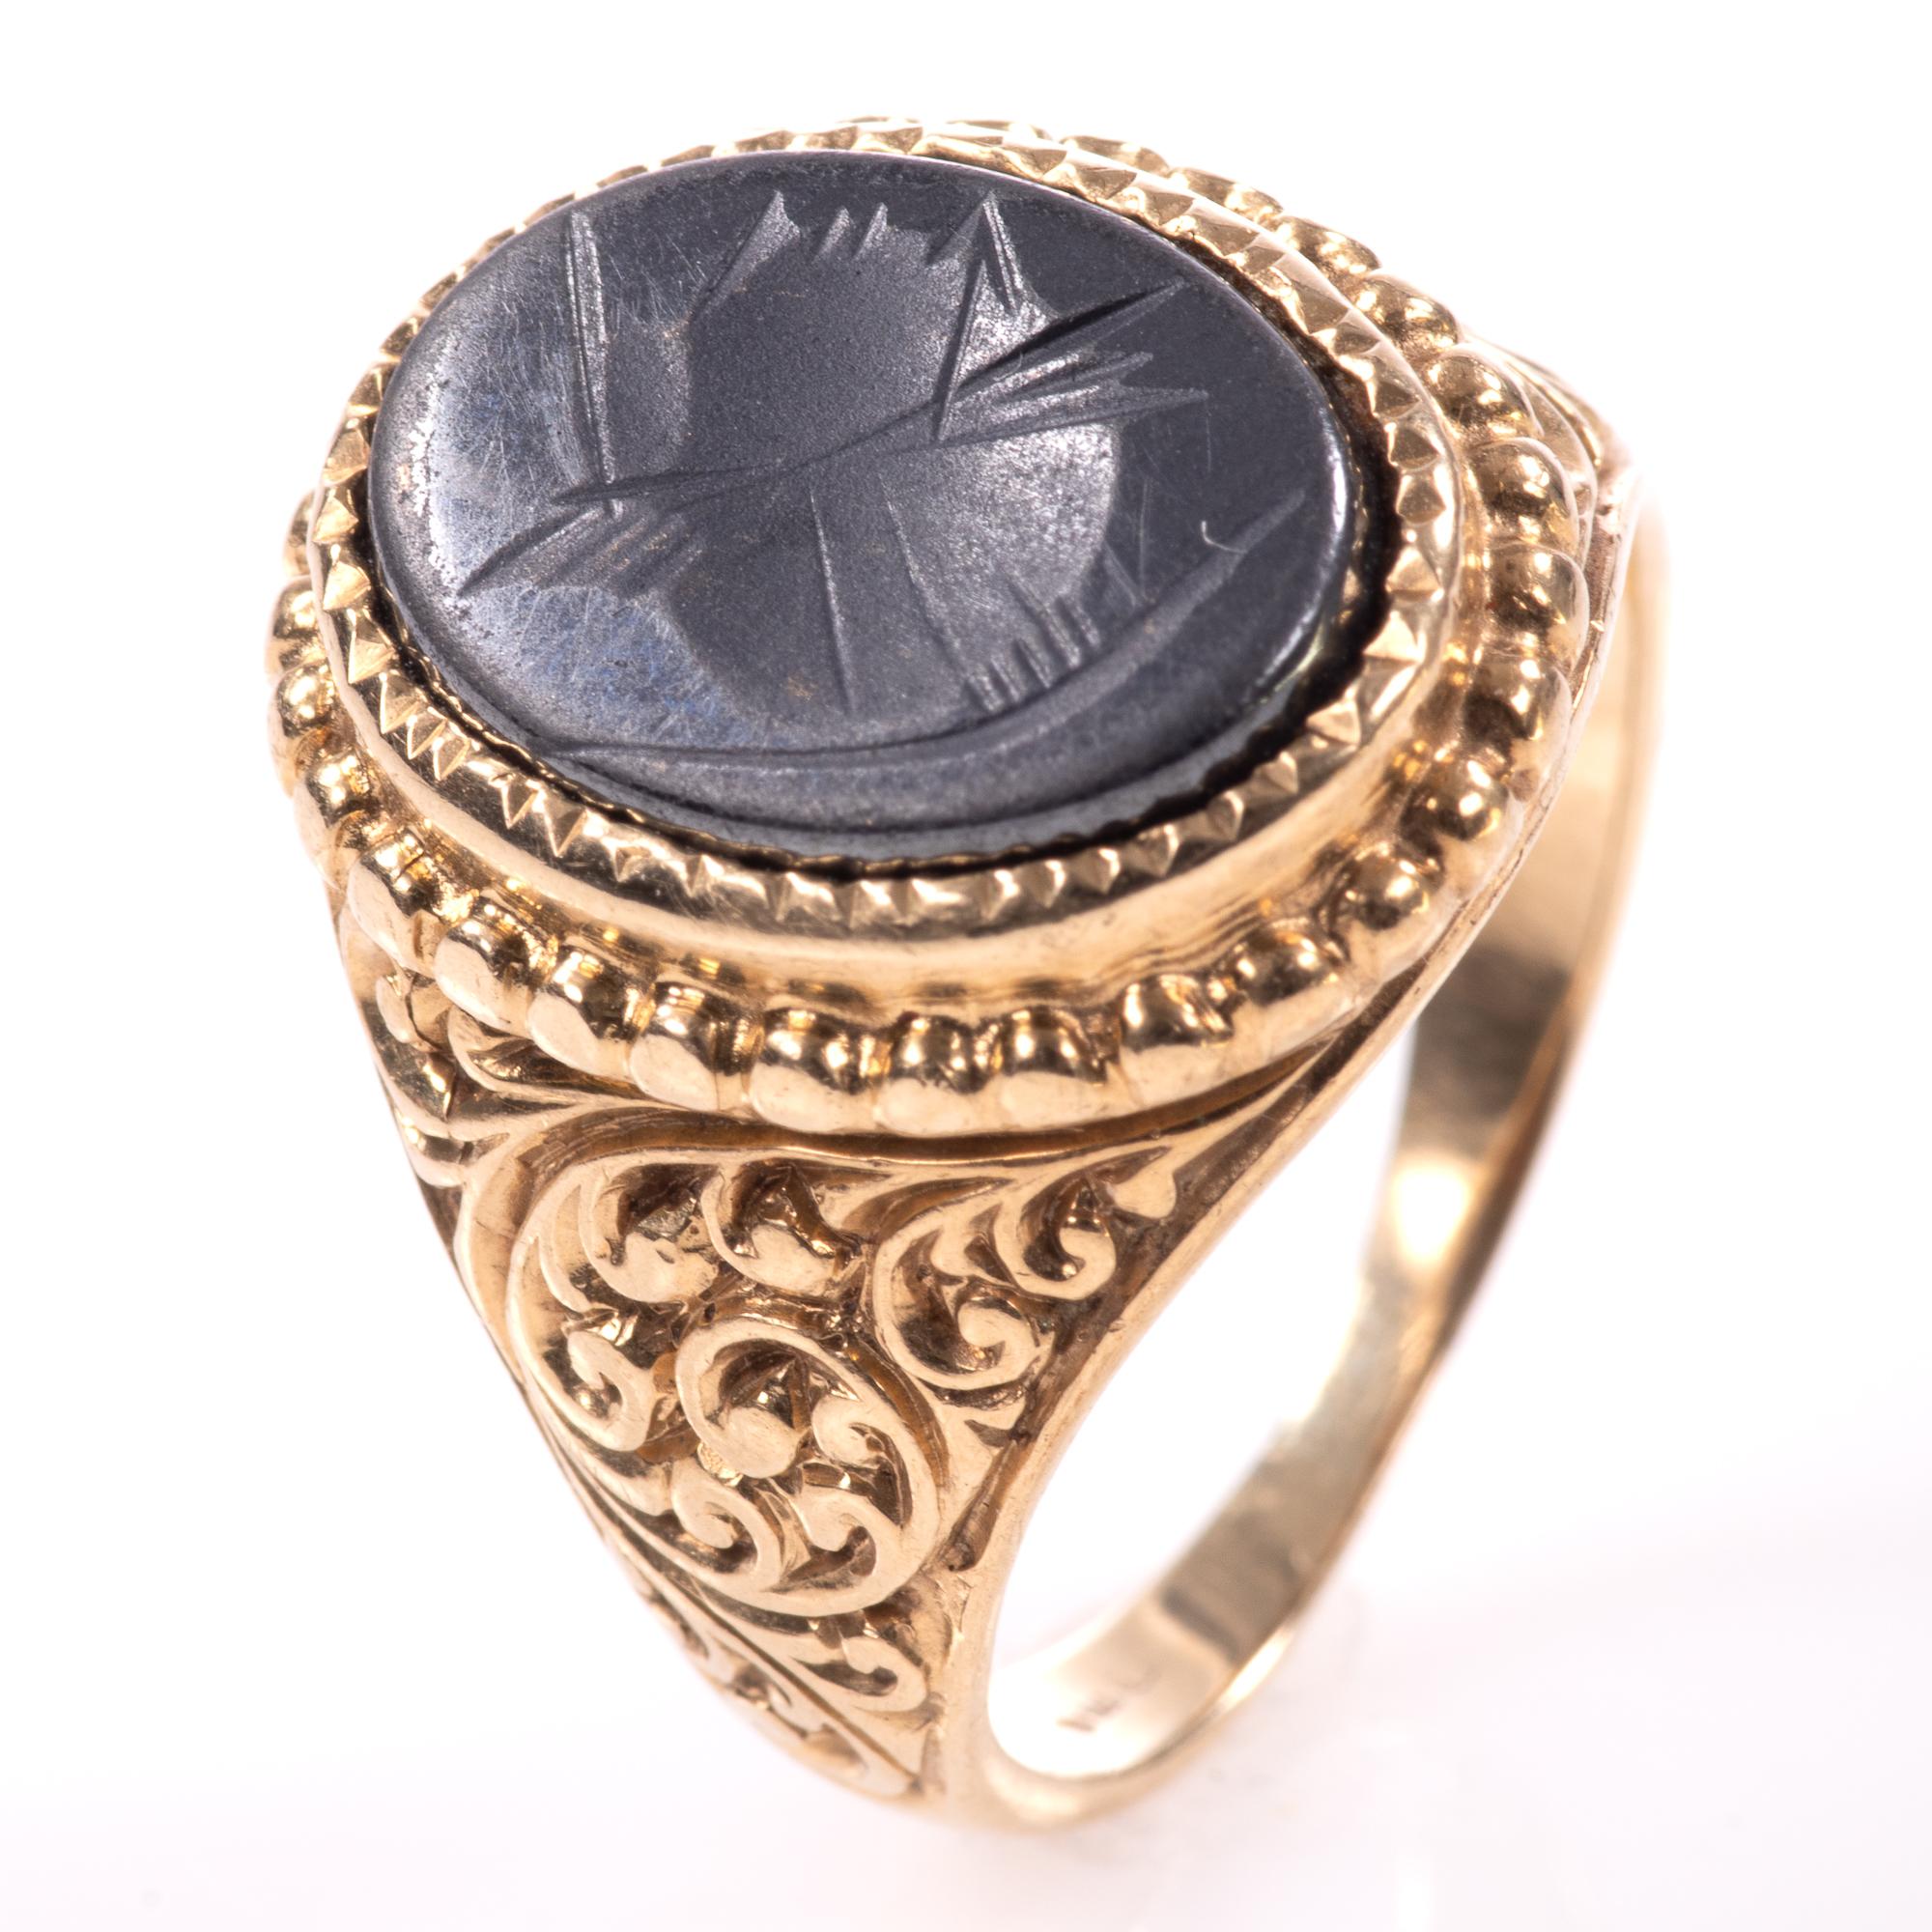 9ct Gold Centurion Onyx Signet Ring